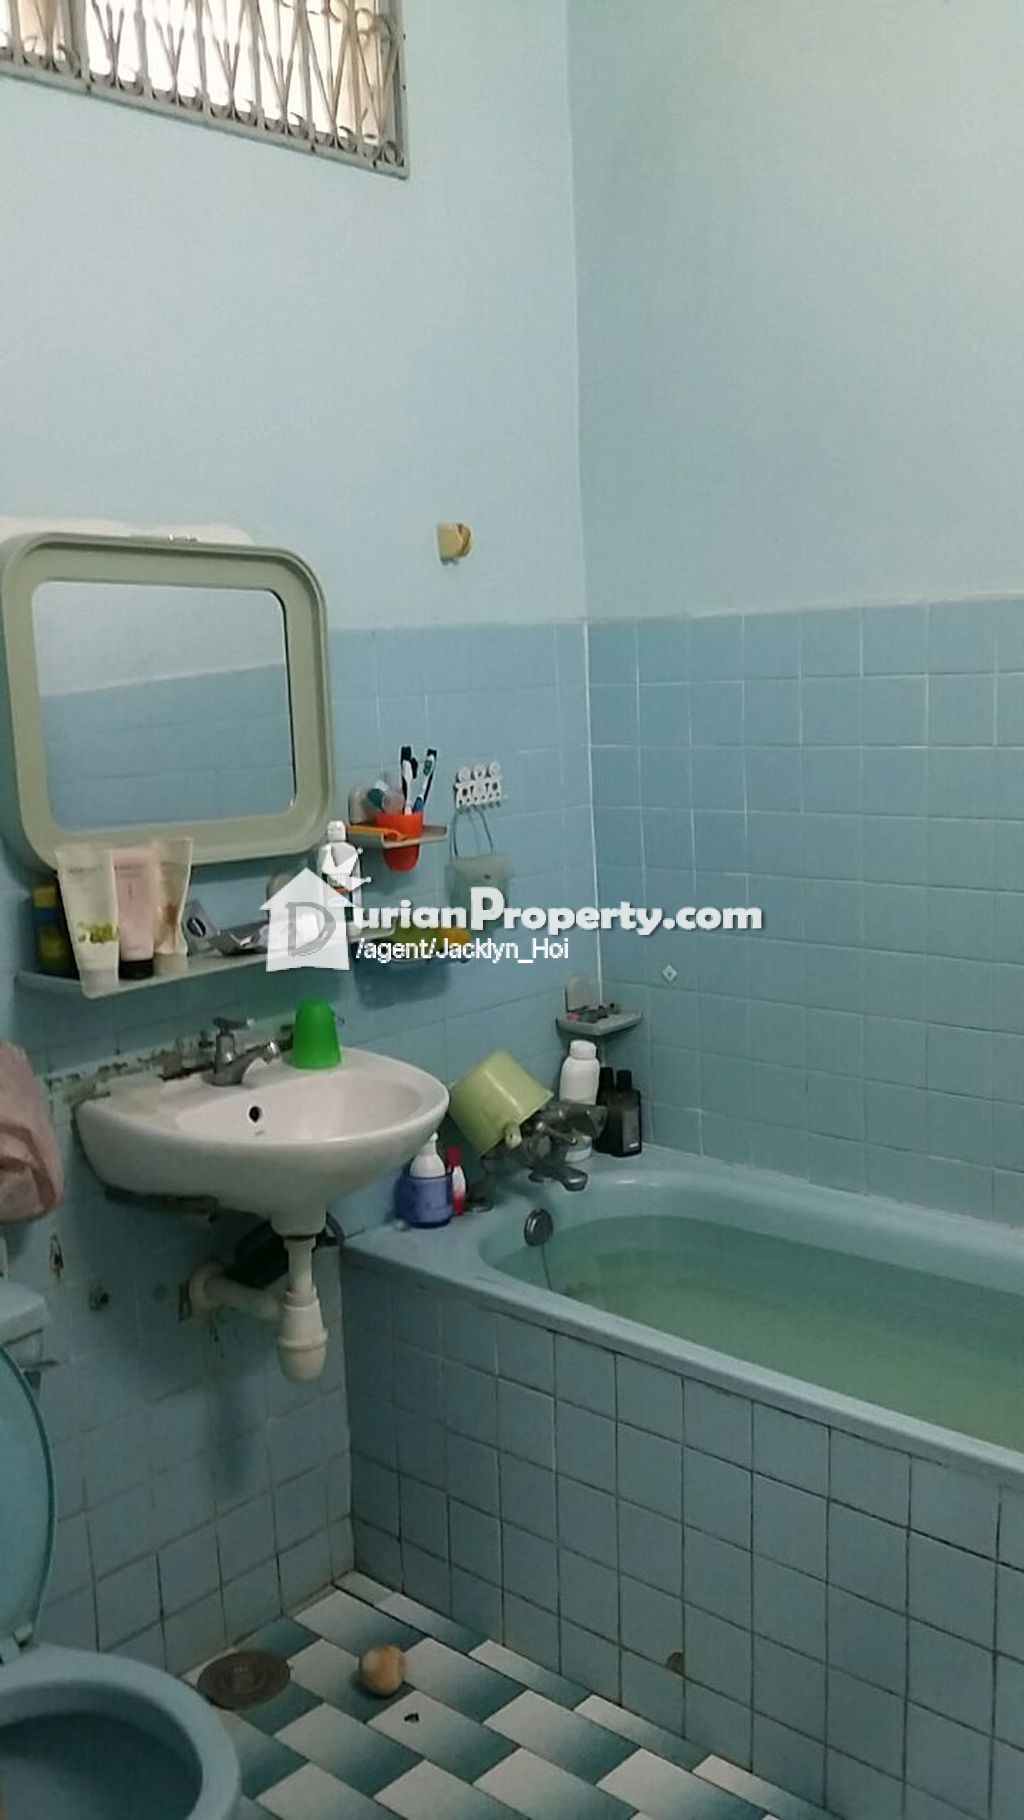 Bathroom Accessories Klang bungalow house for sale at kampung kuantan, klang for rm 1,230,000